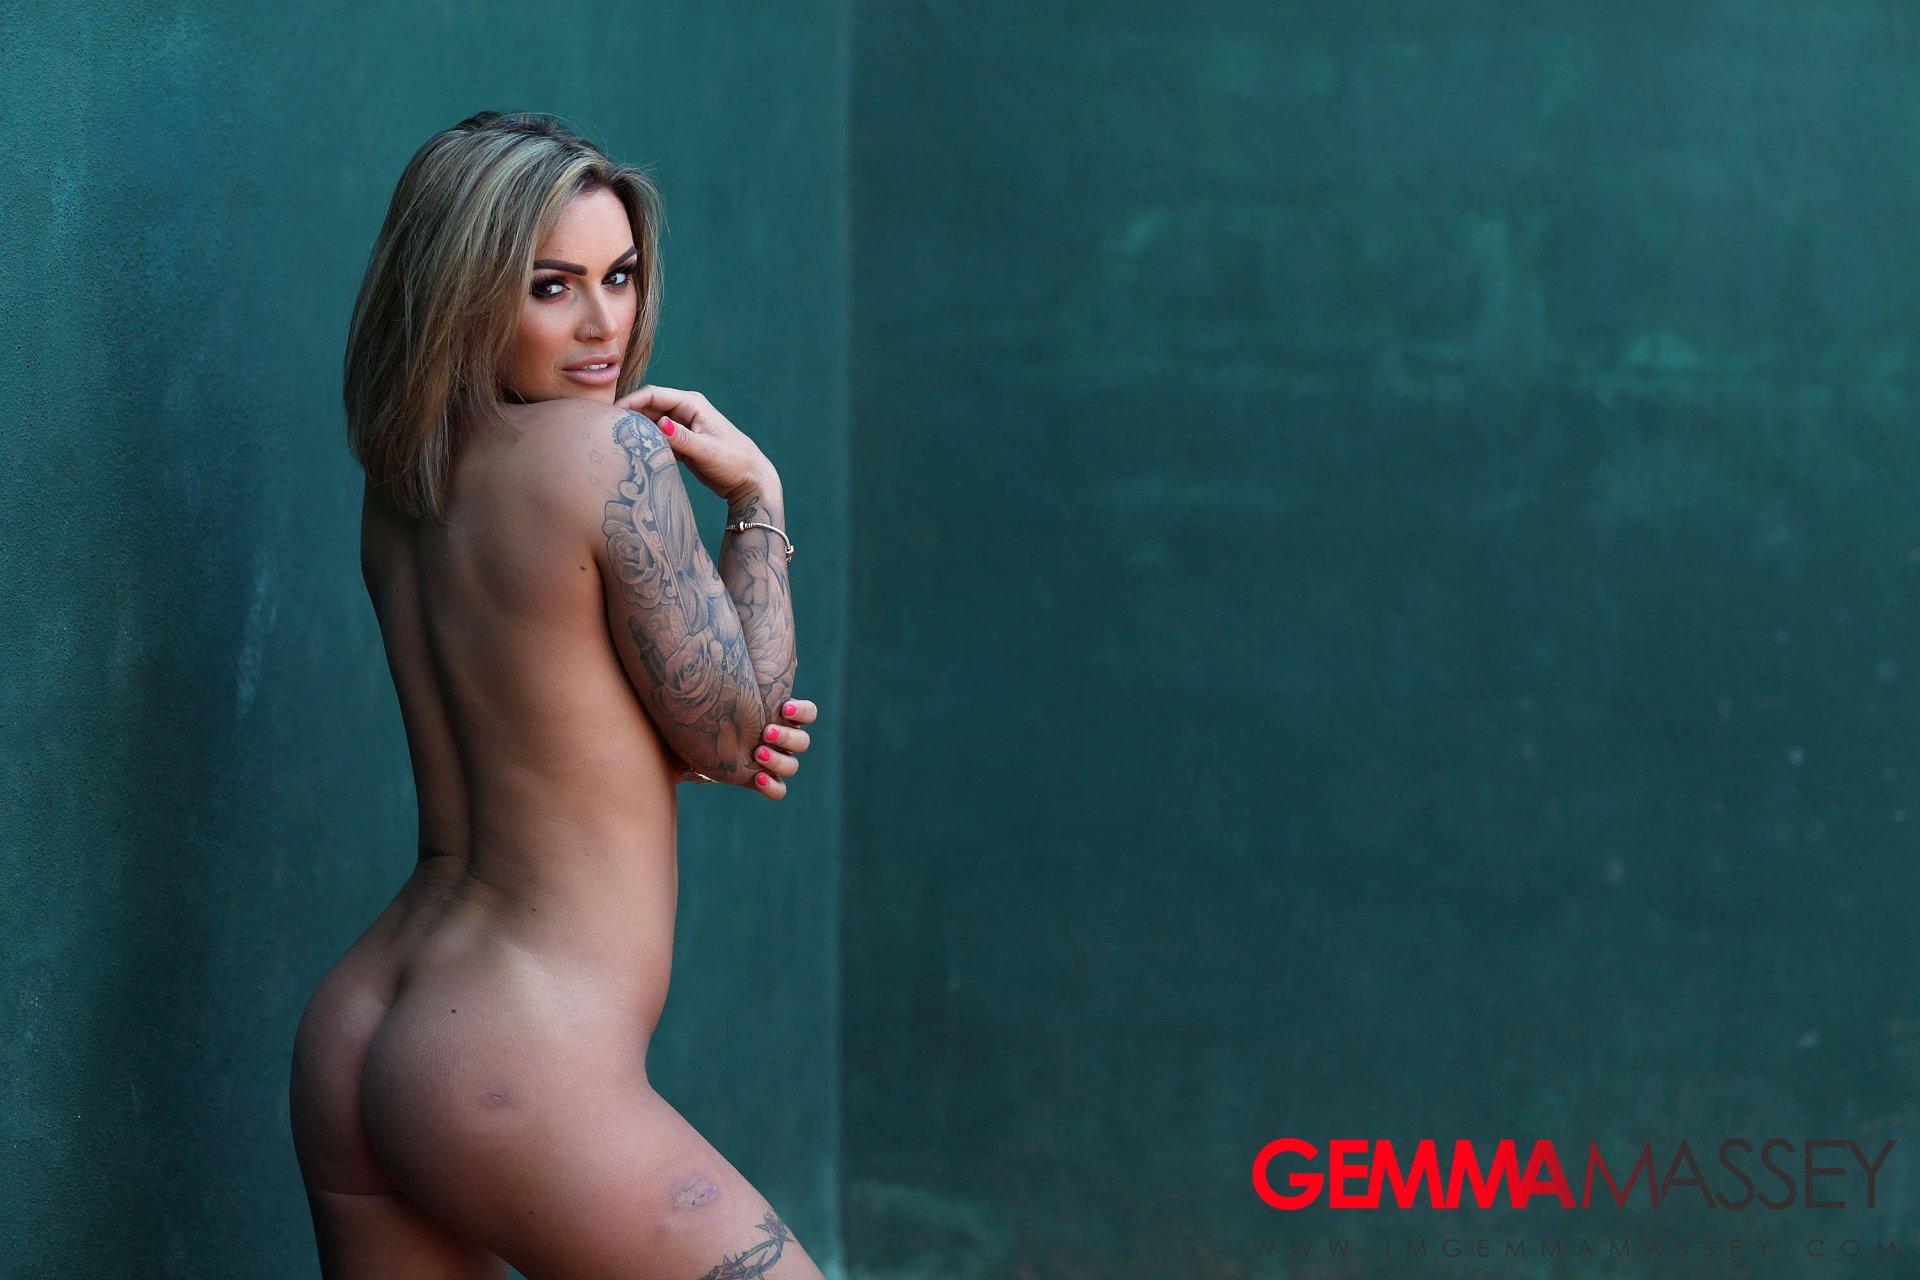 Gemma massey hd